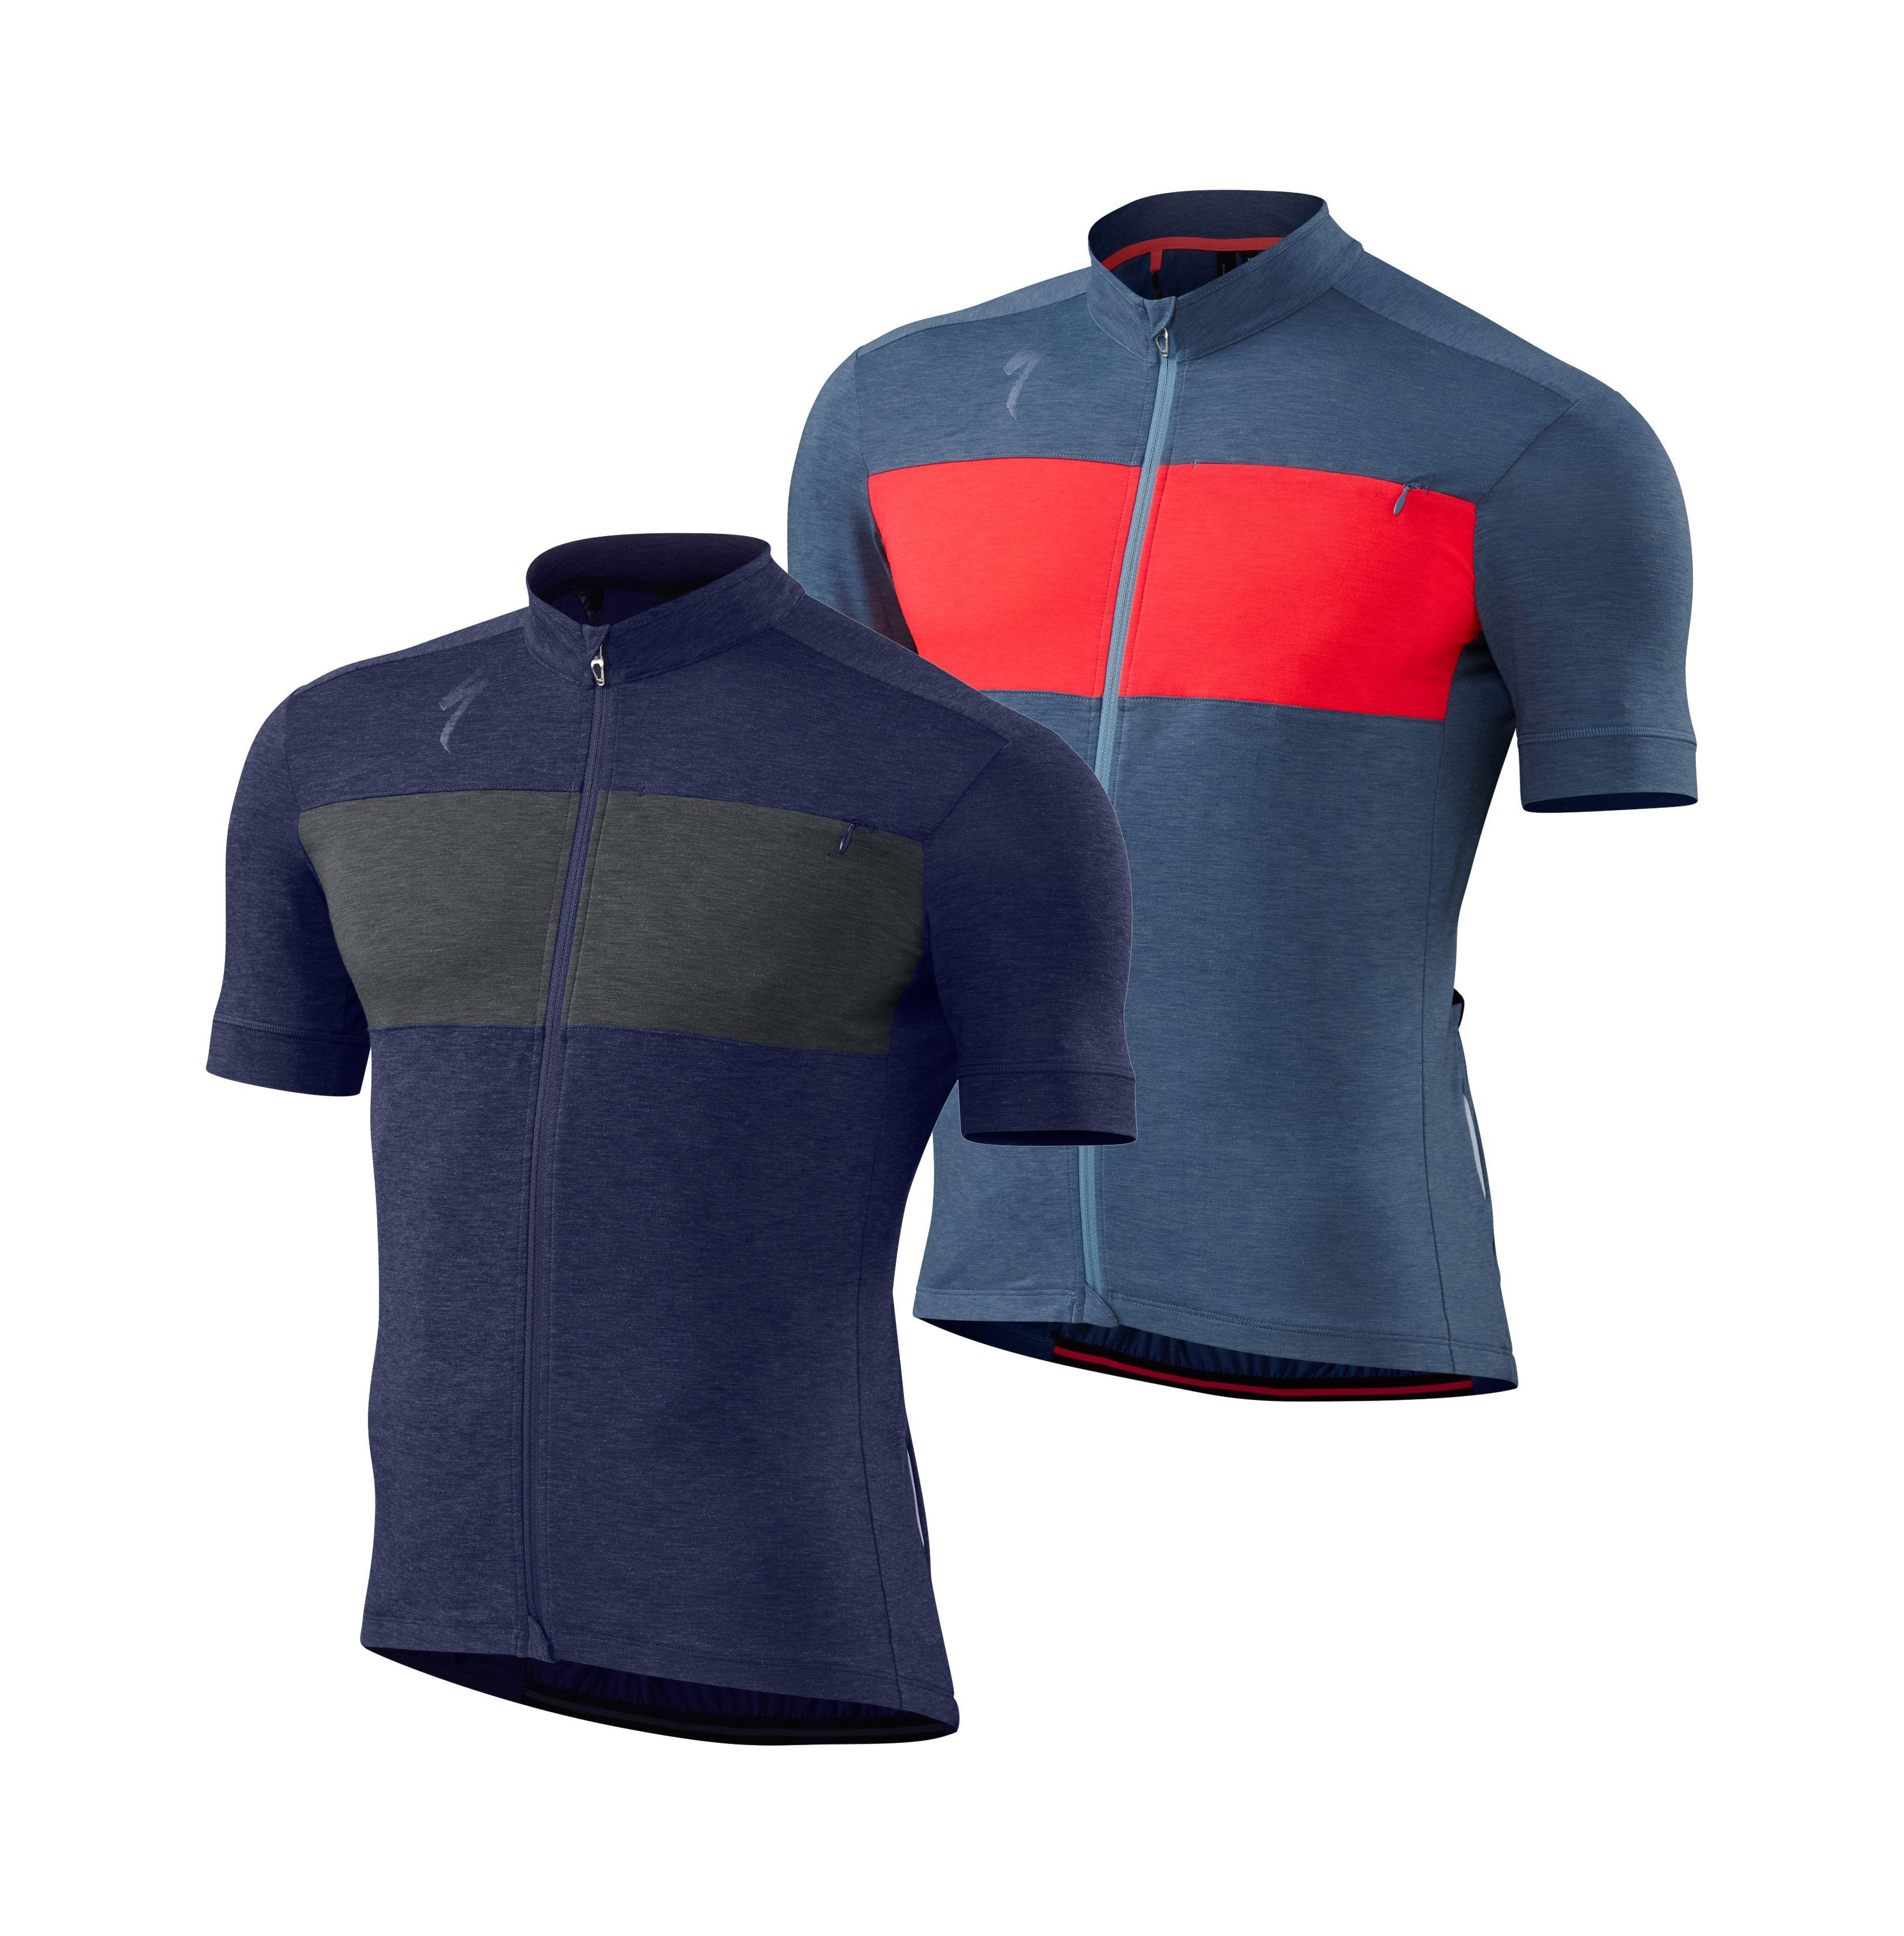 Specialized Rbx Dri-release Merino Short Sleeve Jersey 2018 - £47.99 ... d5f96b8a5